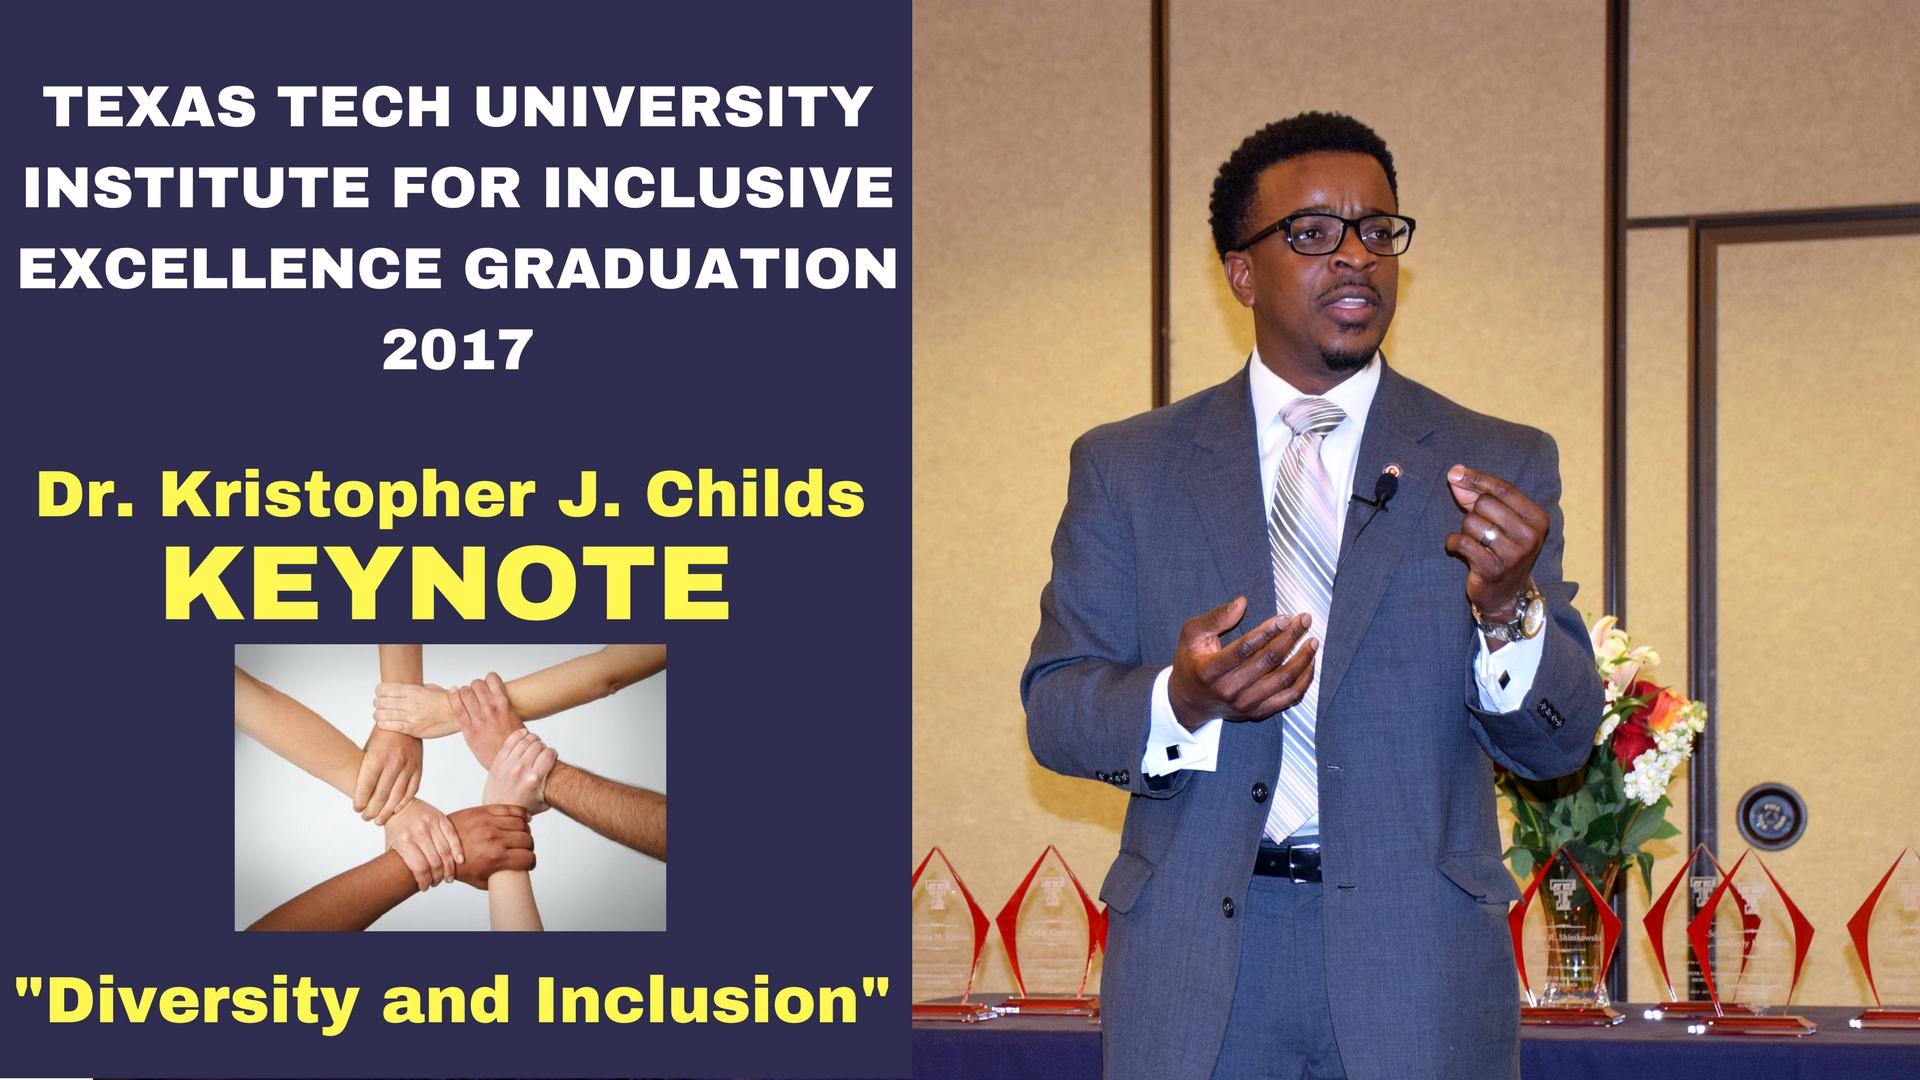 Institute for Inclusive Excellence GradGraduate.JPG